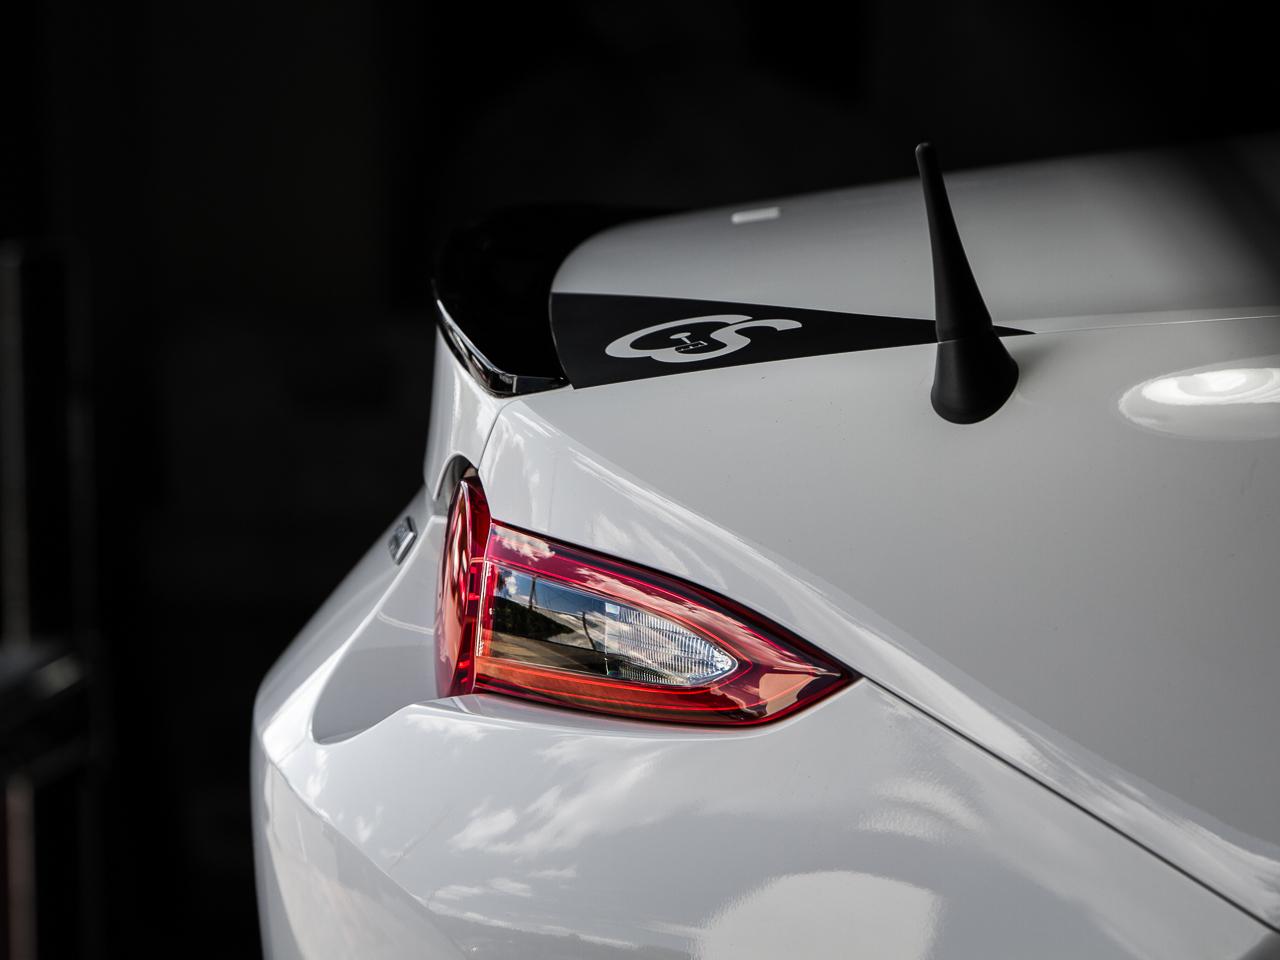 CS-AA313-246 The Original Stubby Antenna Replacement for 2016-2015 Mazda Miata Installed